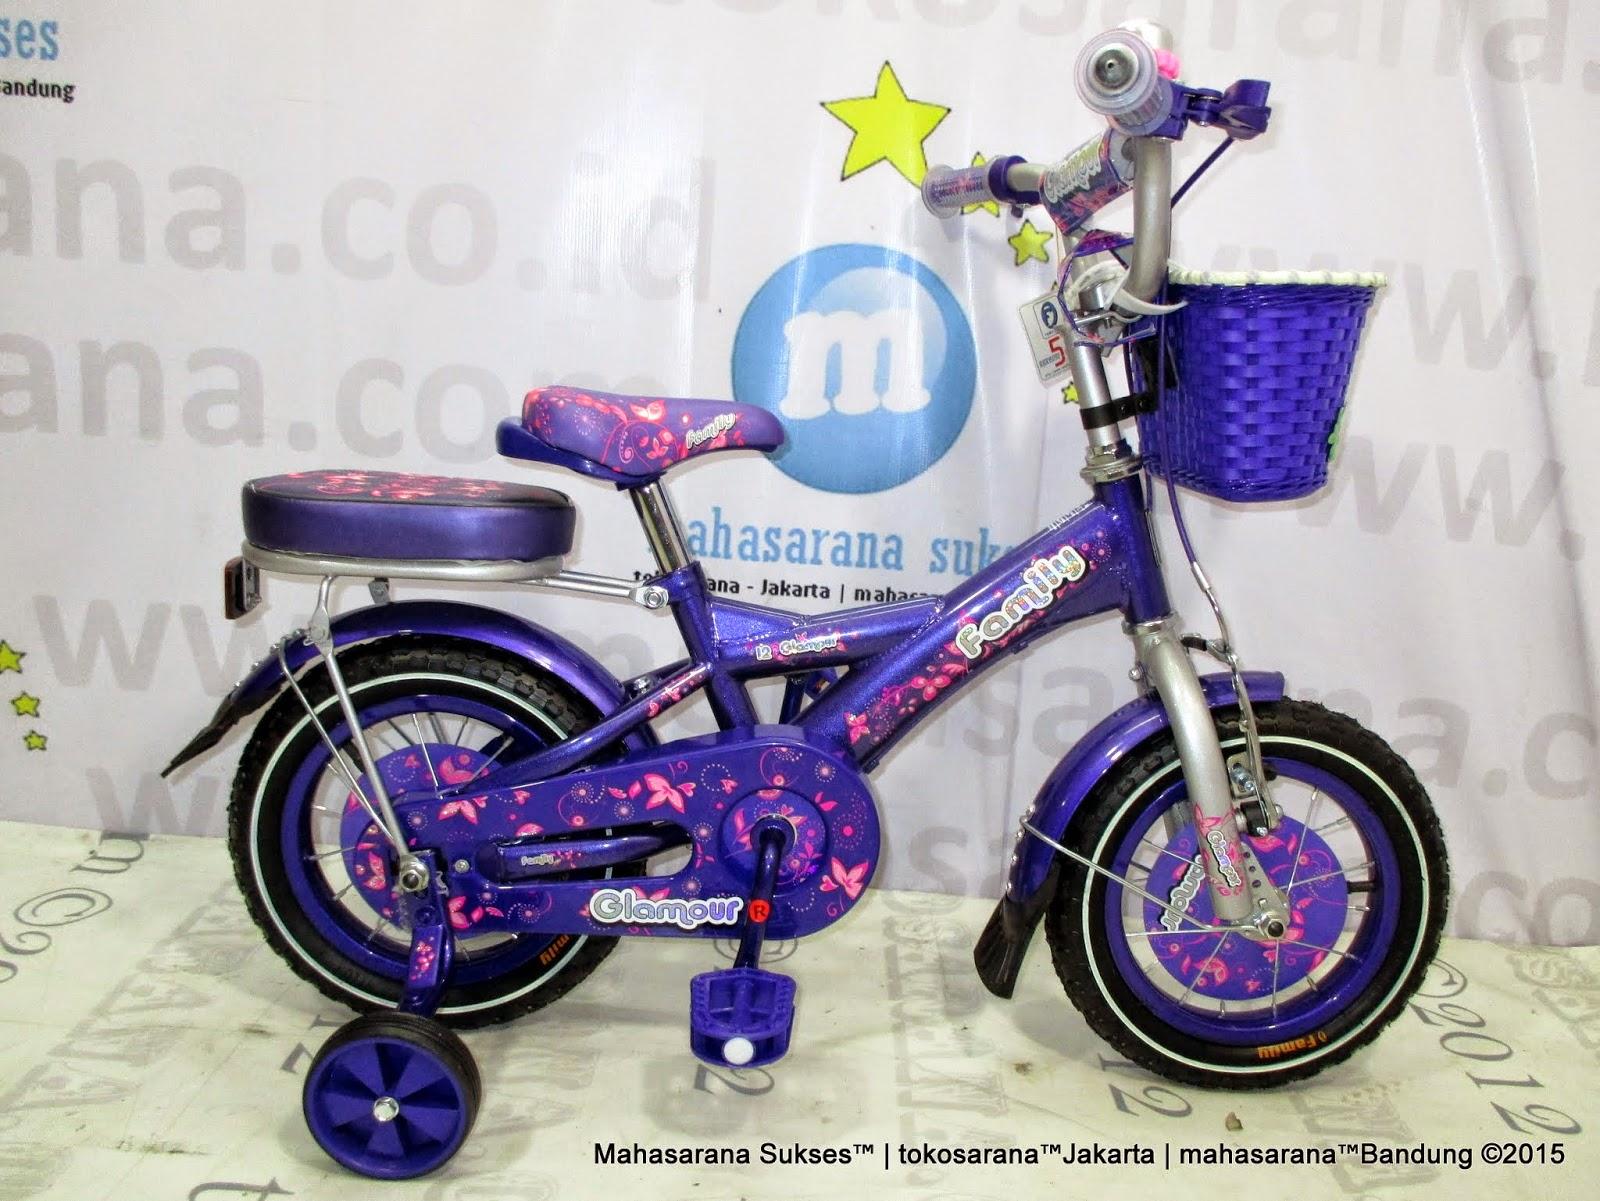 tokosarana™Jakarta Mahasarana Sukses™Bandung Sepeda